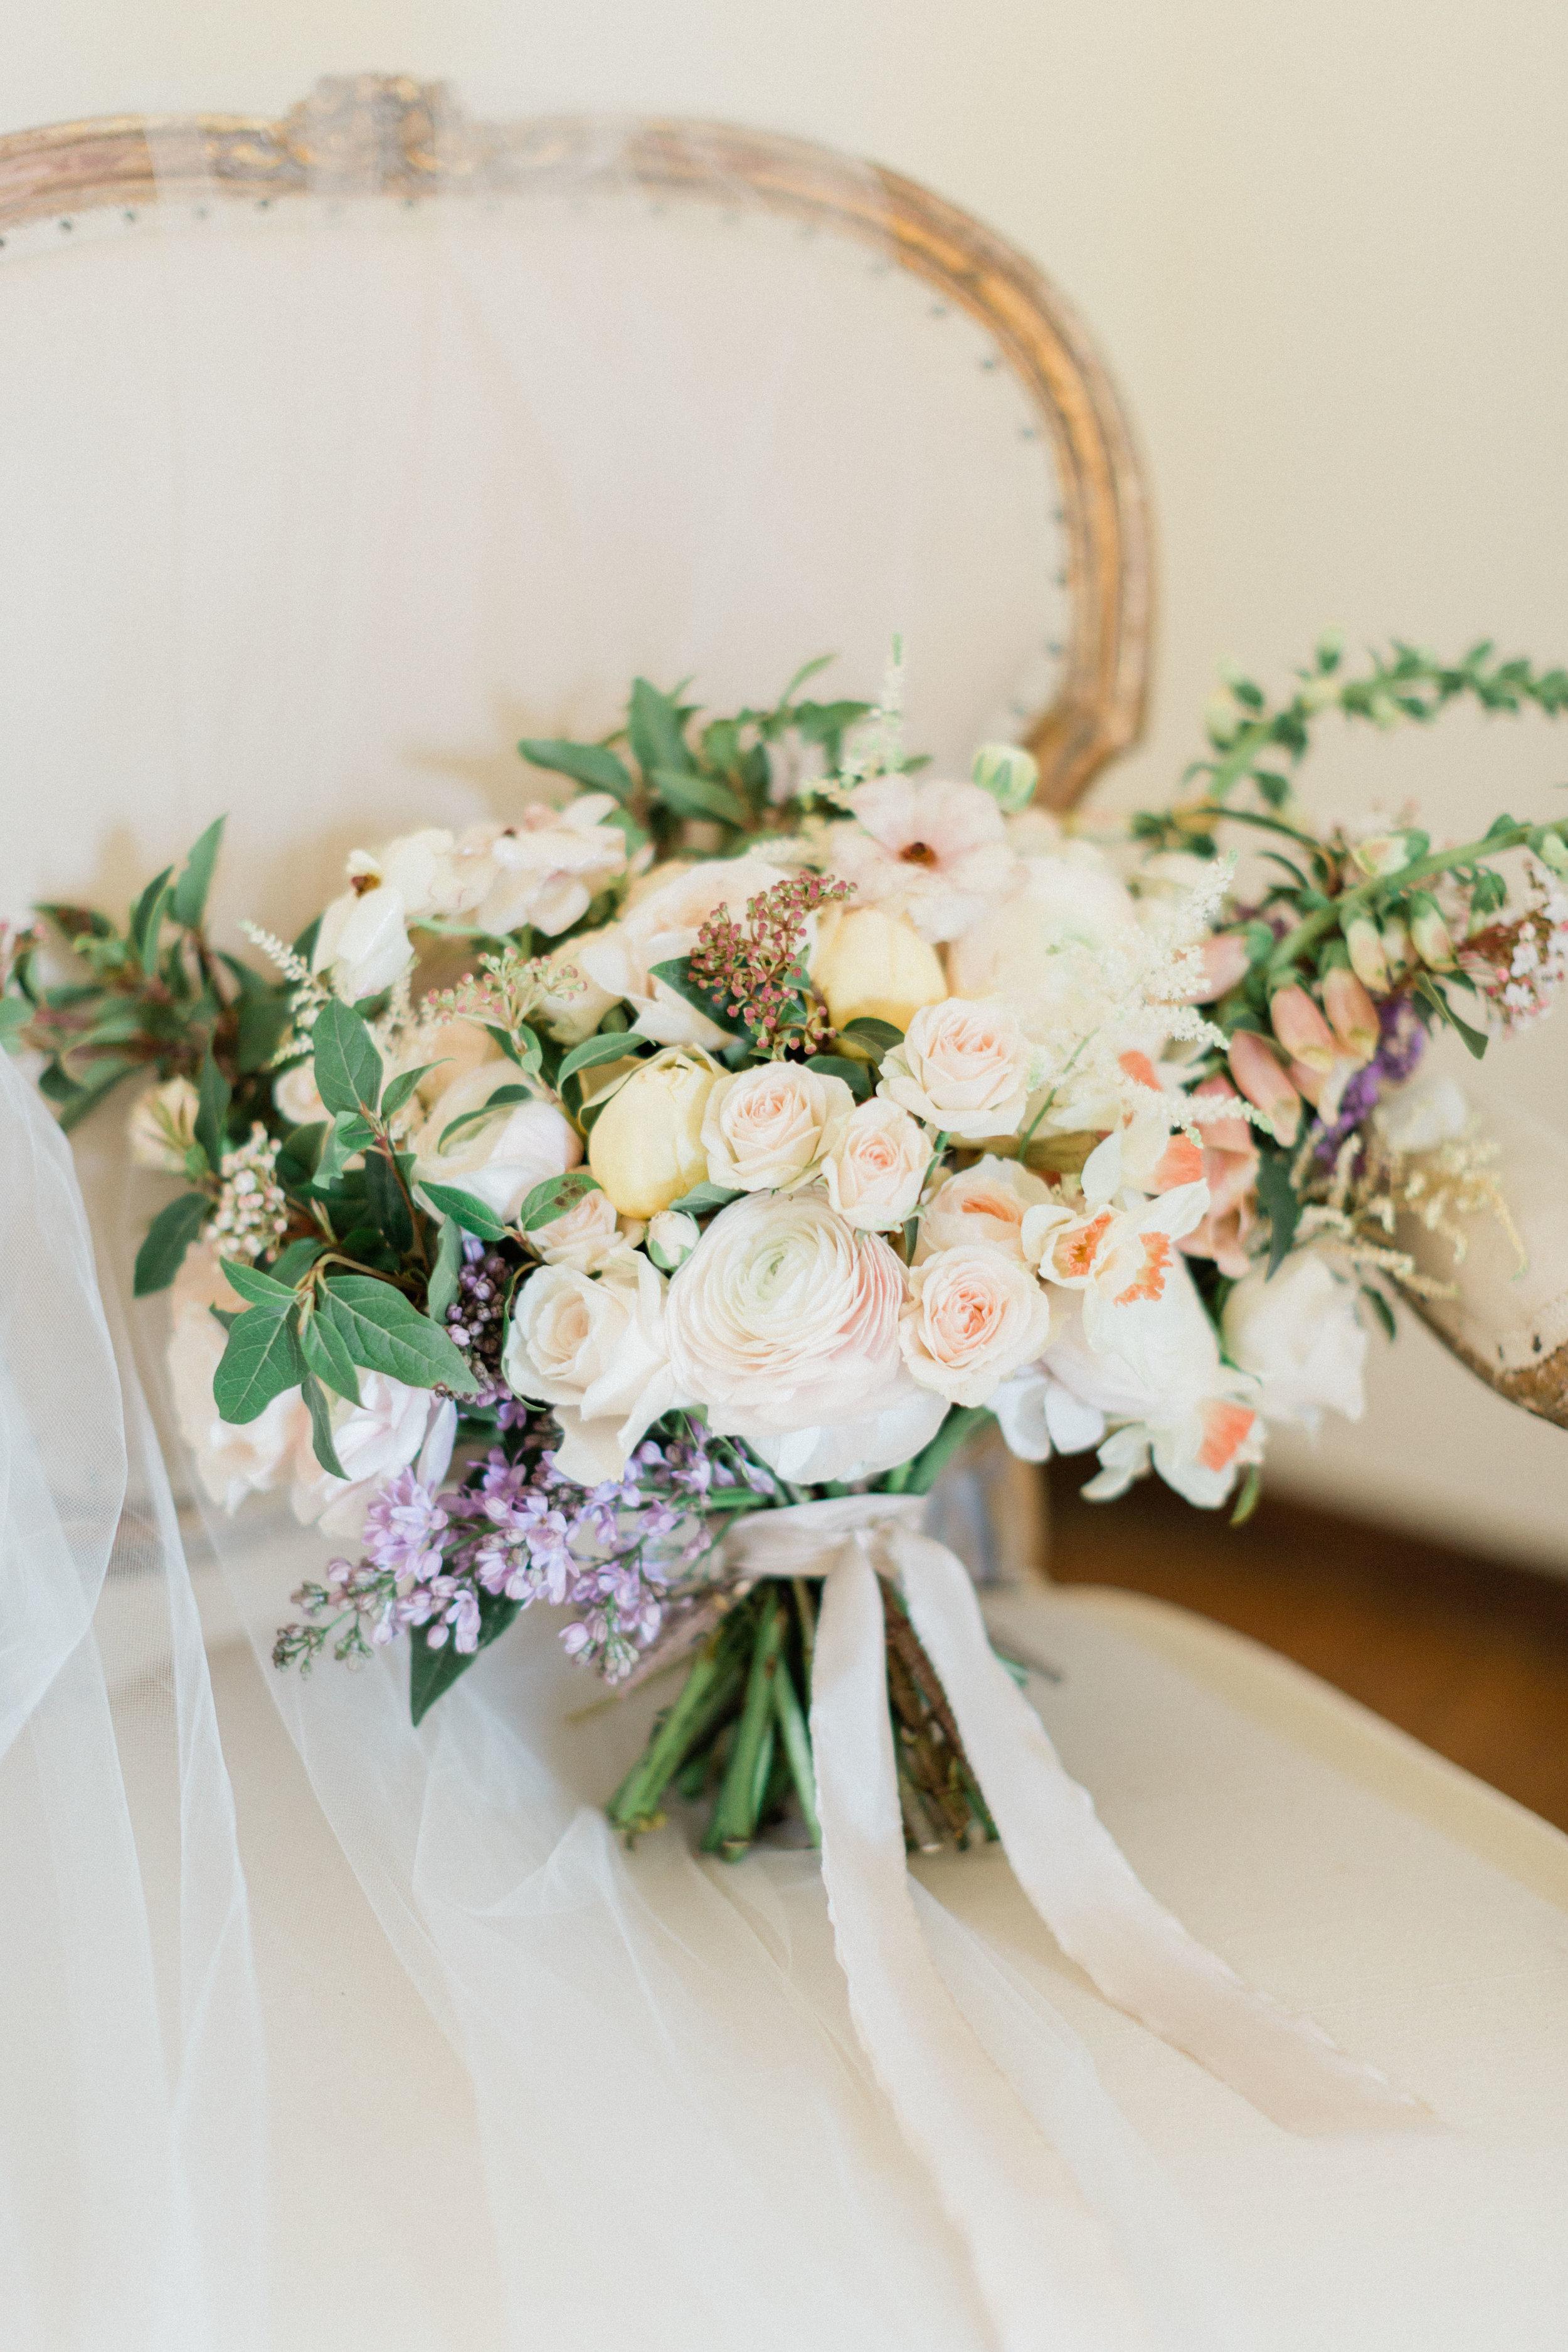 Garden_Style_Lush_Florals_Sibyl_Sophia_Des_Moines_Iowa.jpg